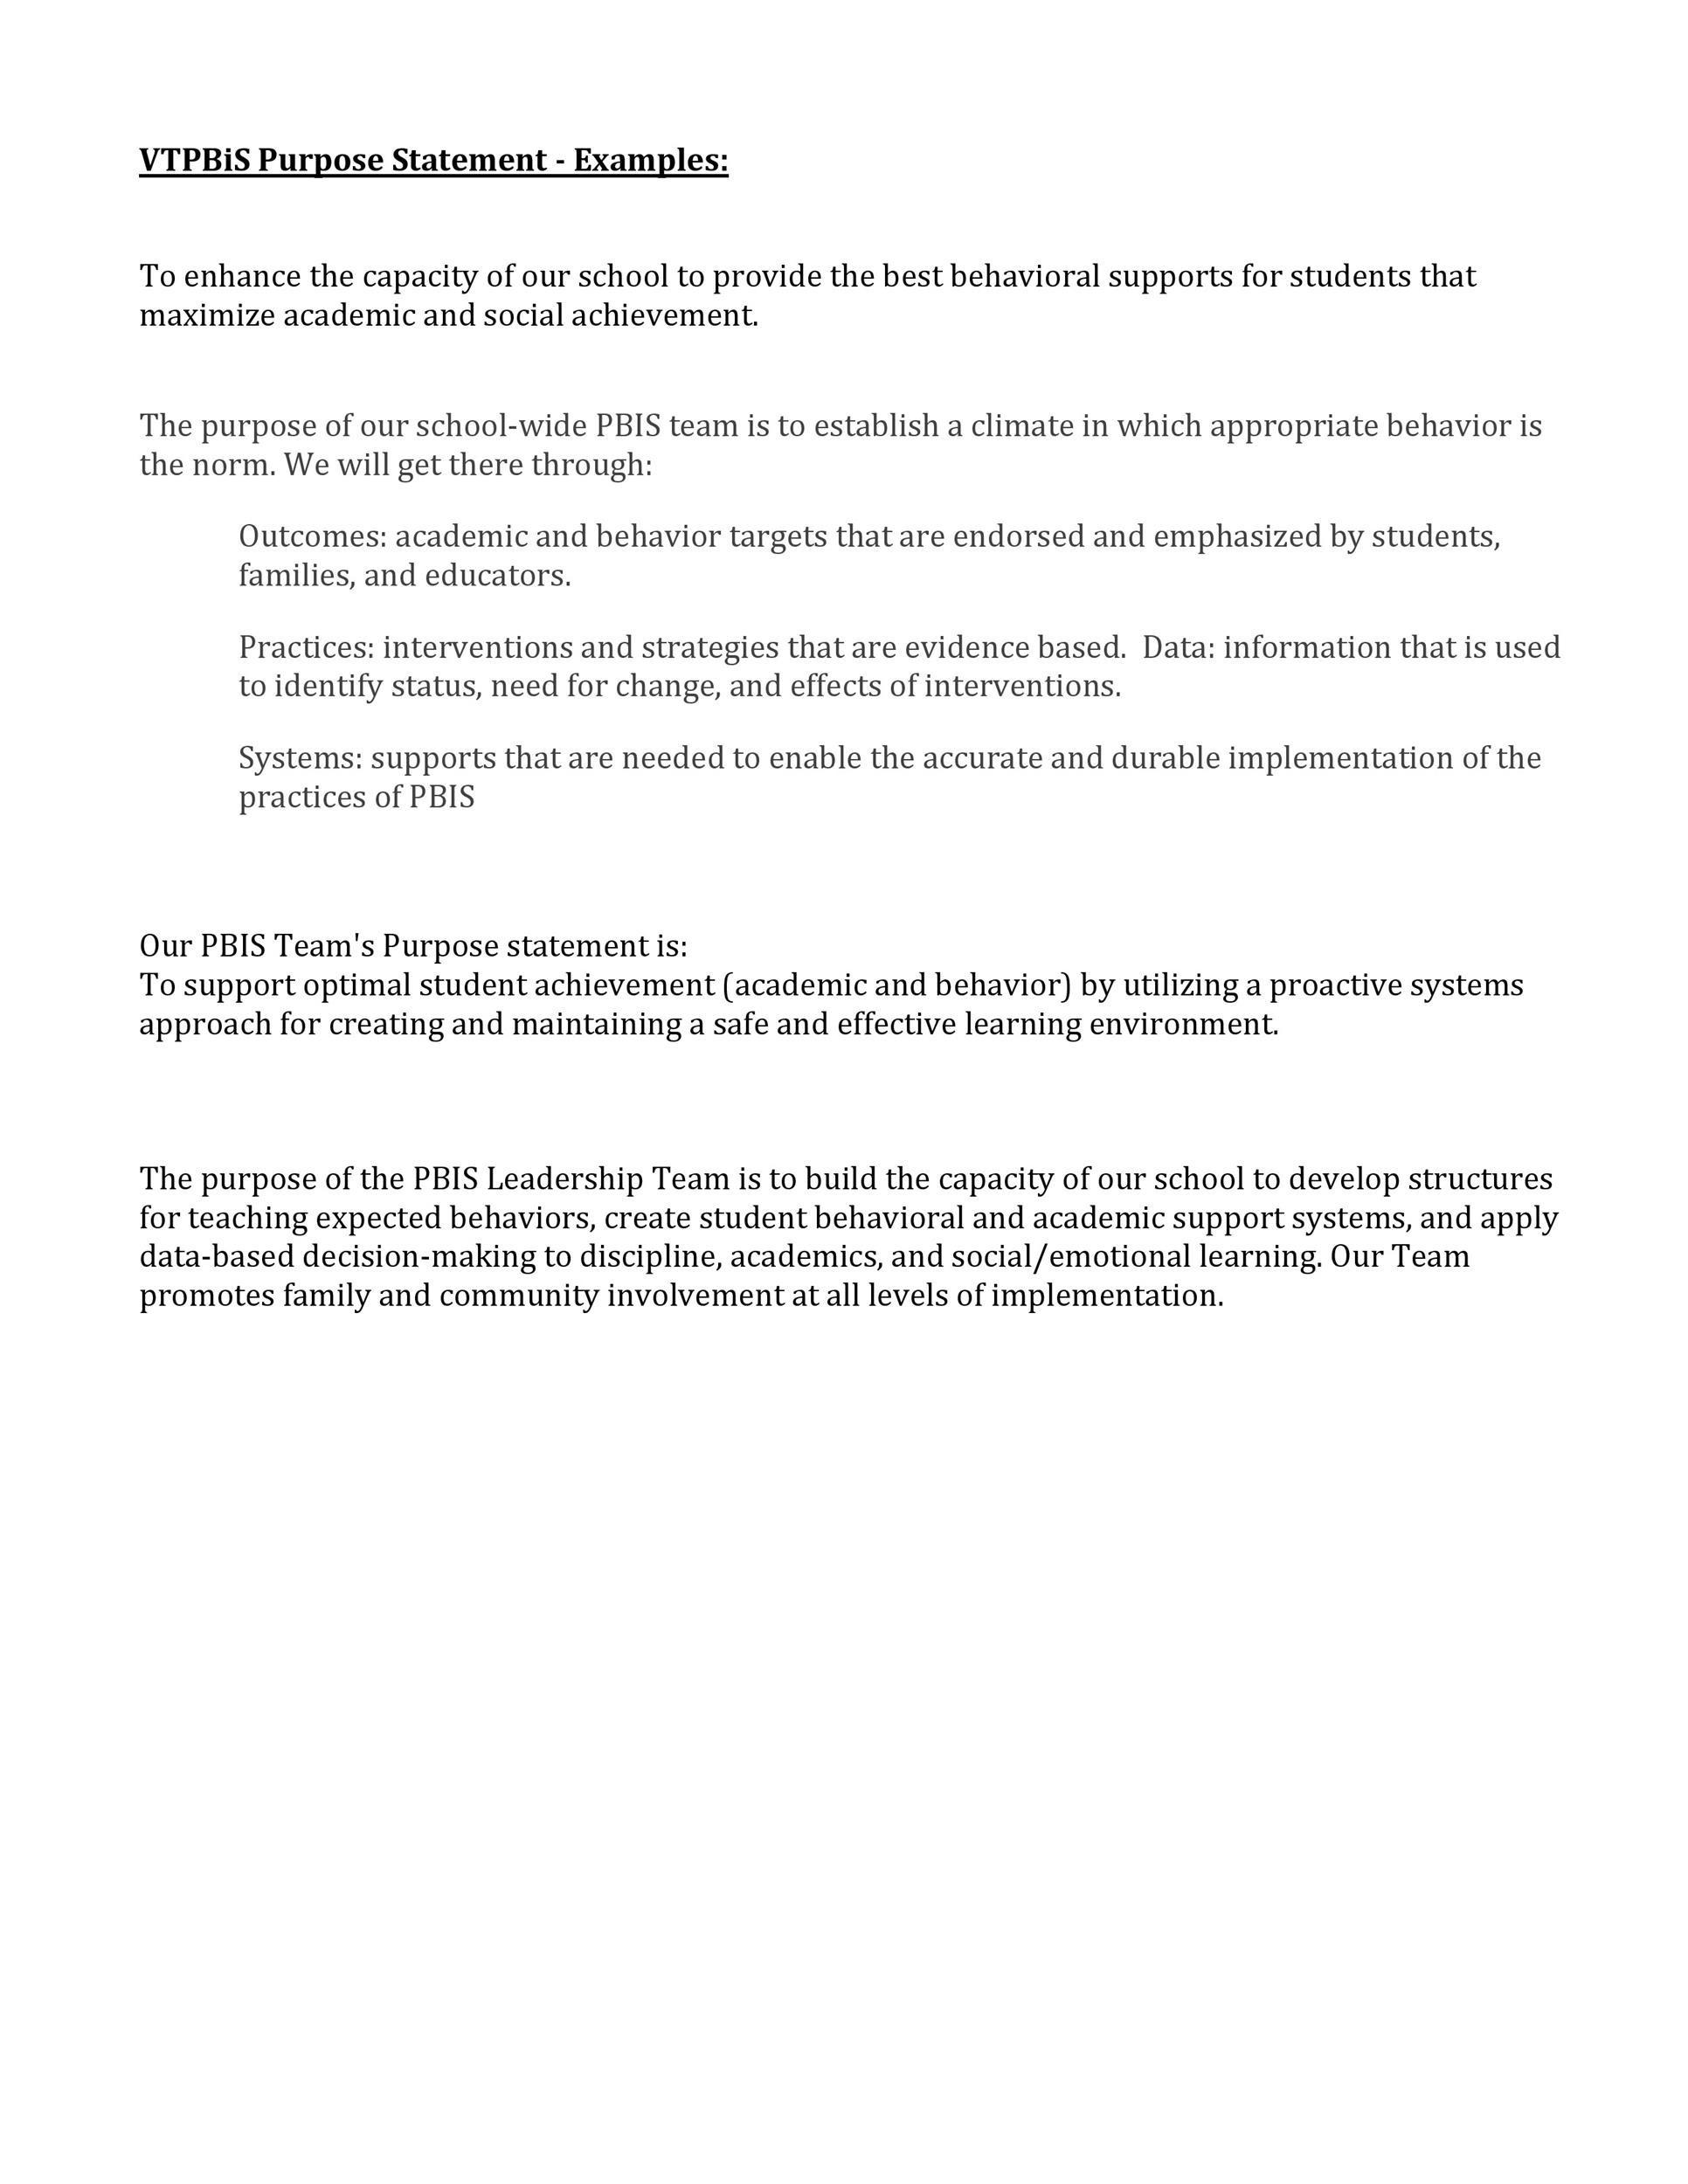 Free statement of purpose example 44